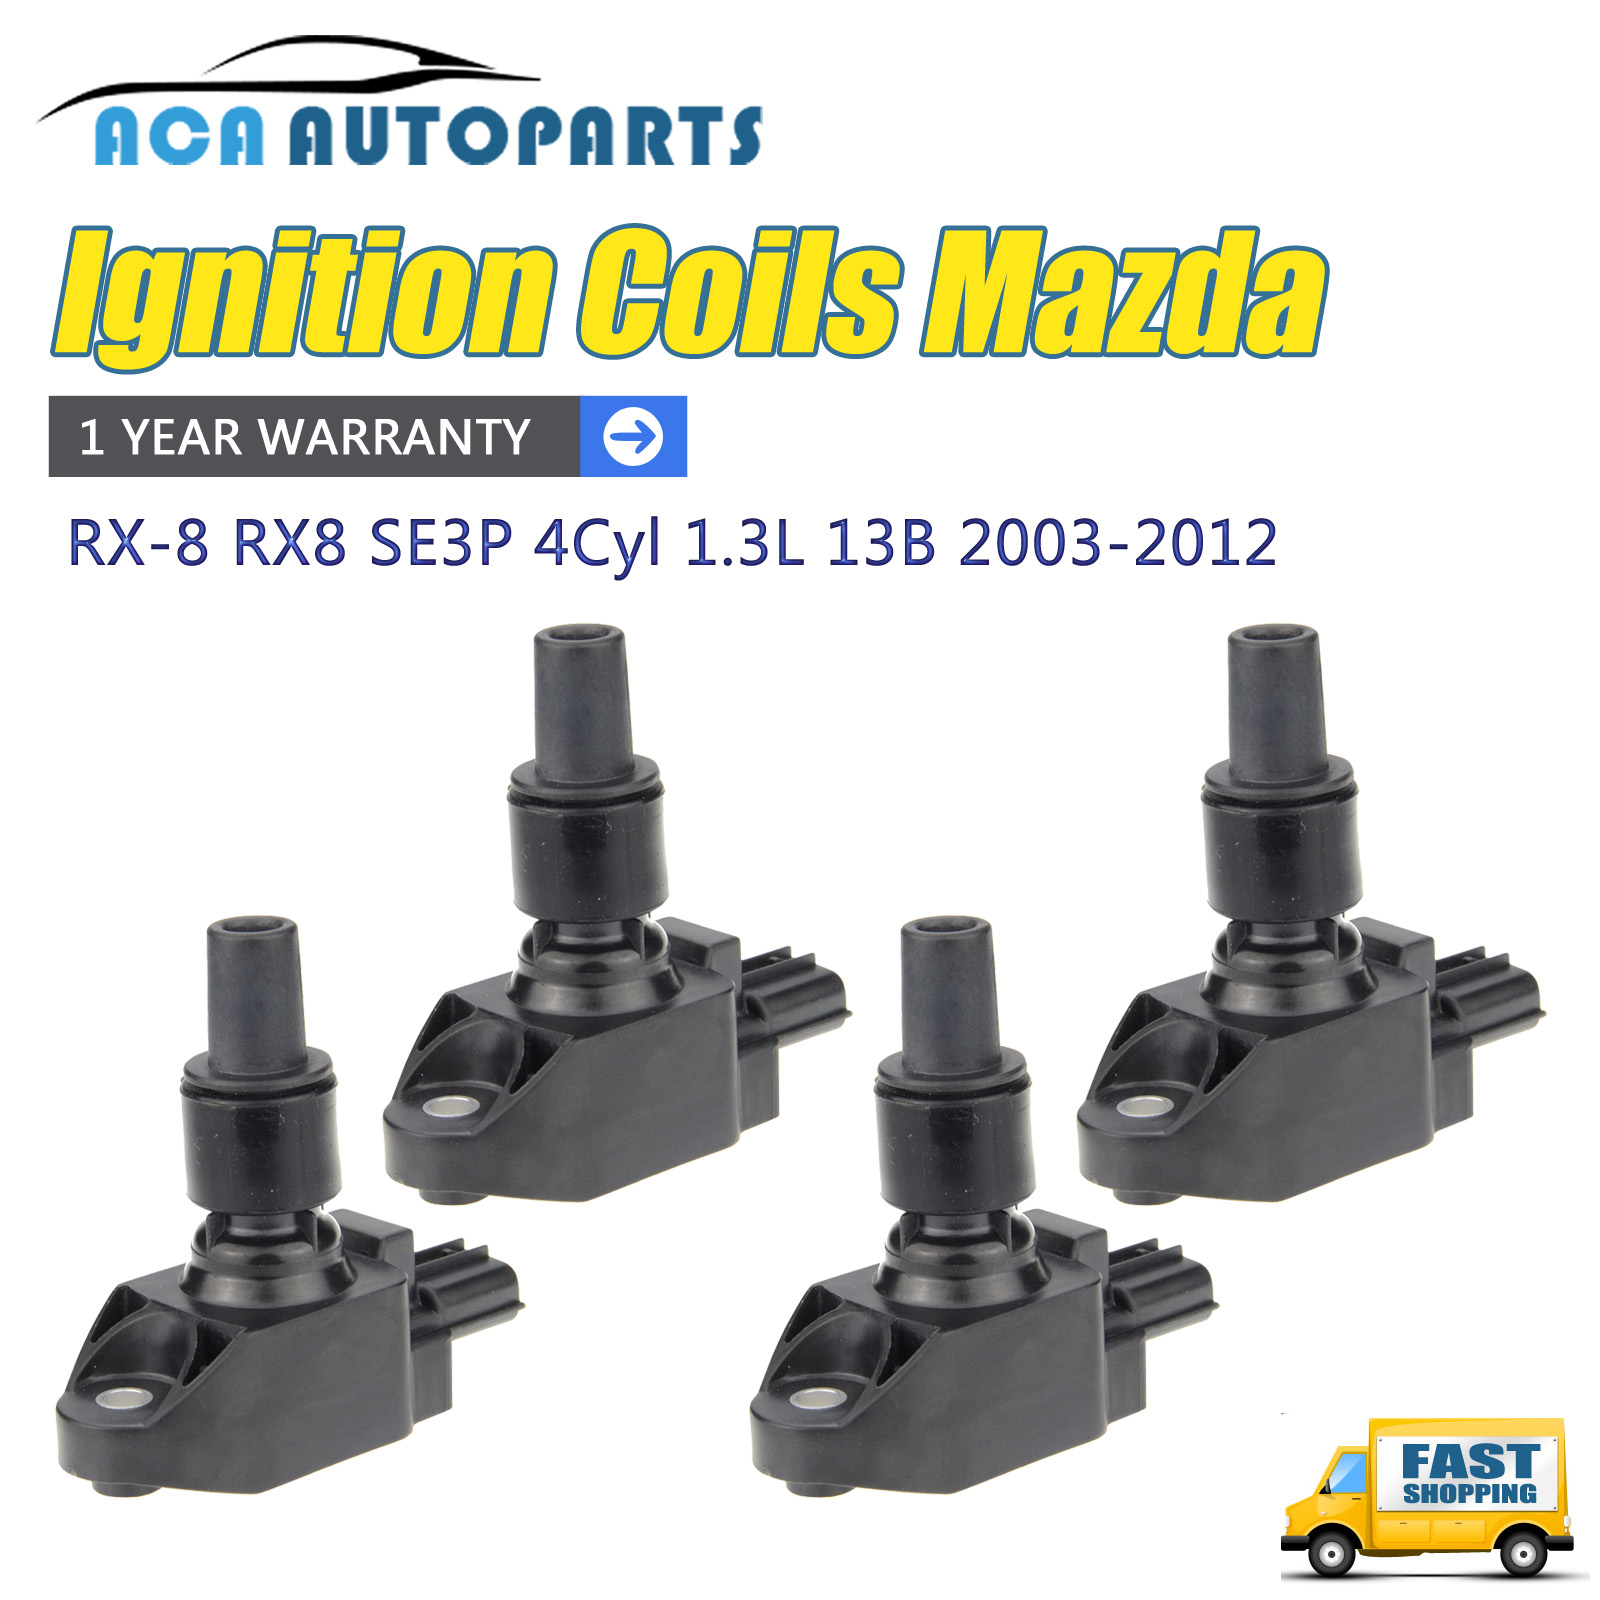 Rx7 Engine Code: Mazda Rx 8 Engine Codes, Mazda, Free Engine Image For User